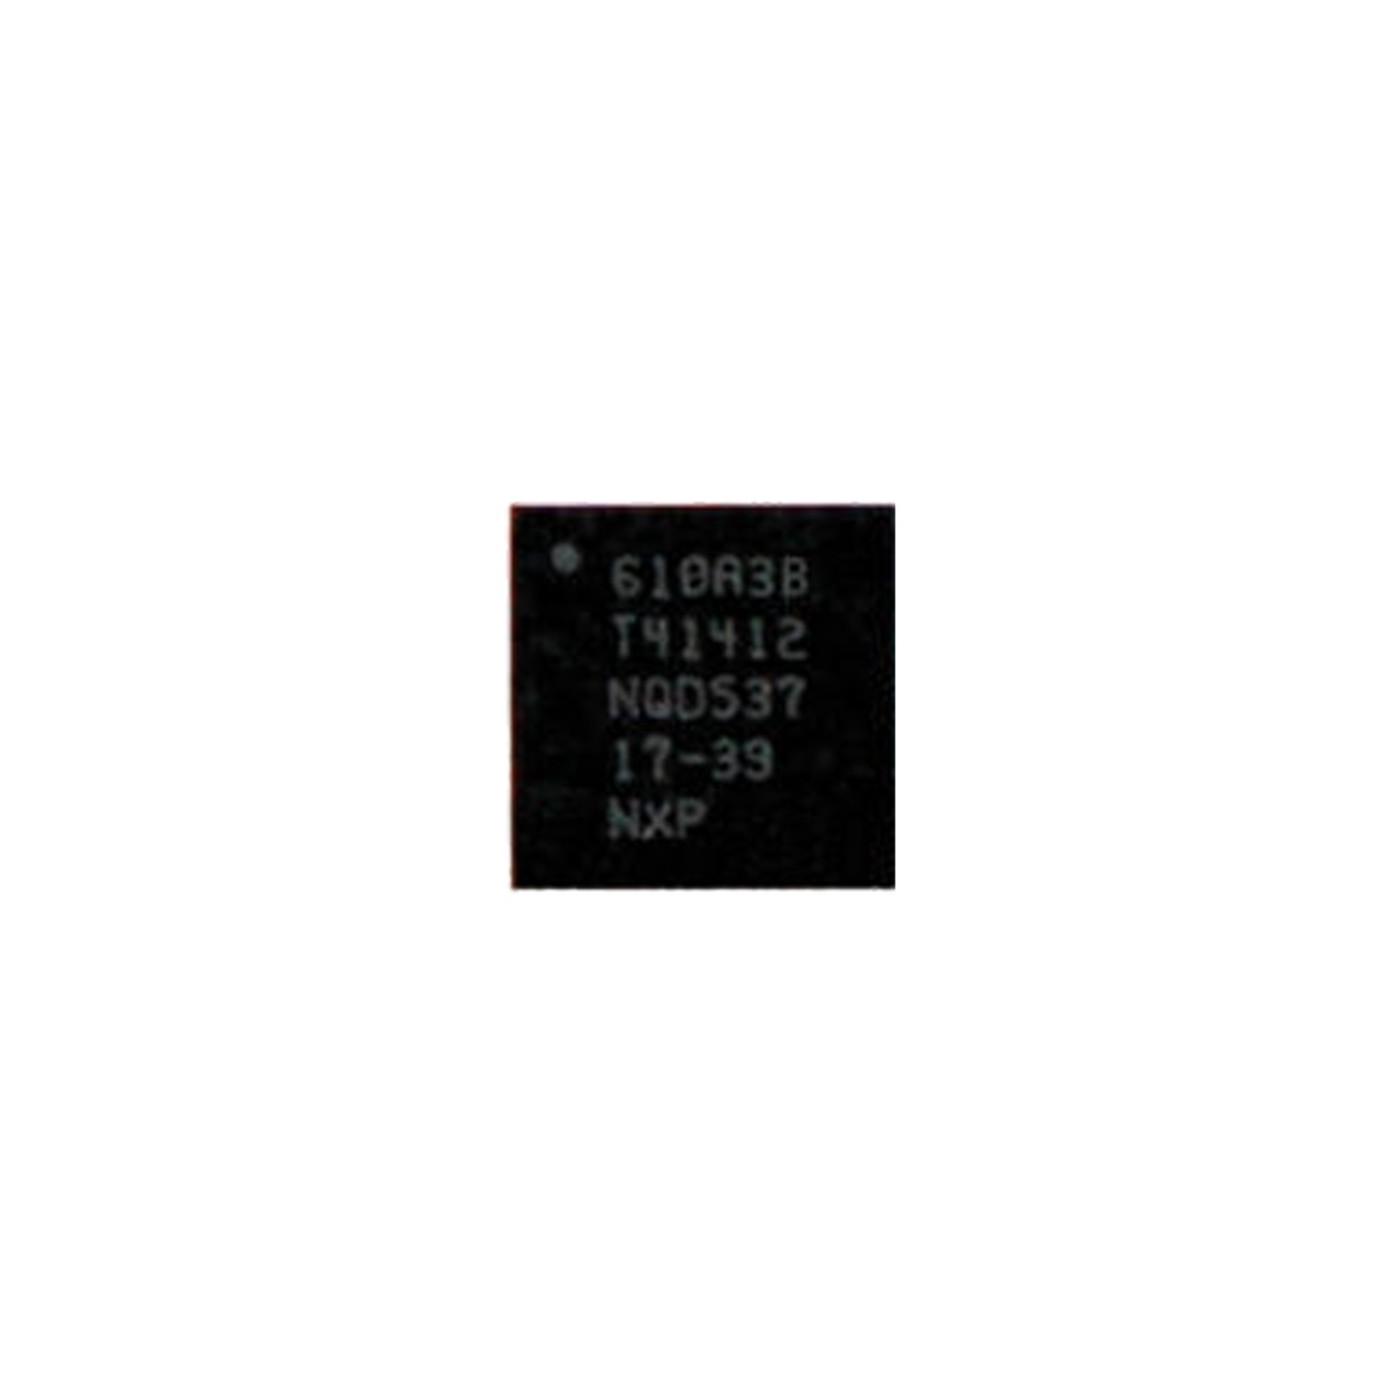 U2 610A3B U4001 IC Ladechip für iPhone 7G - 7 - 7+ - 7 PLUS